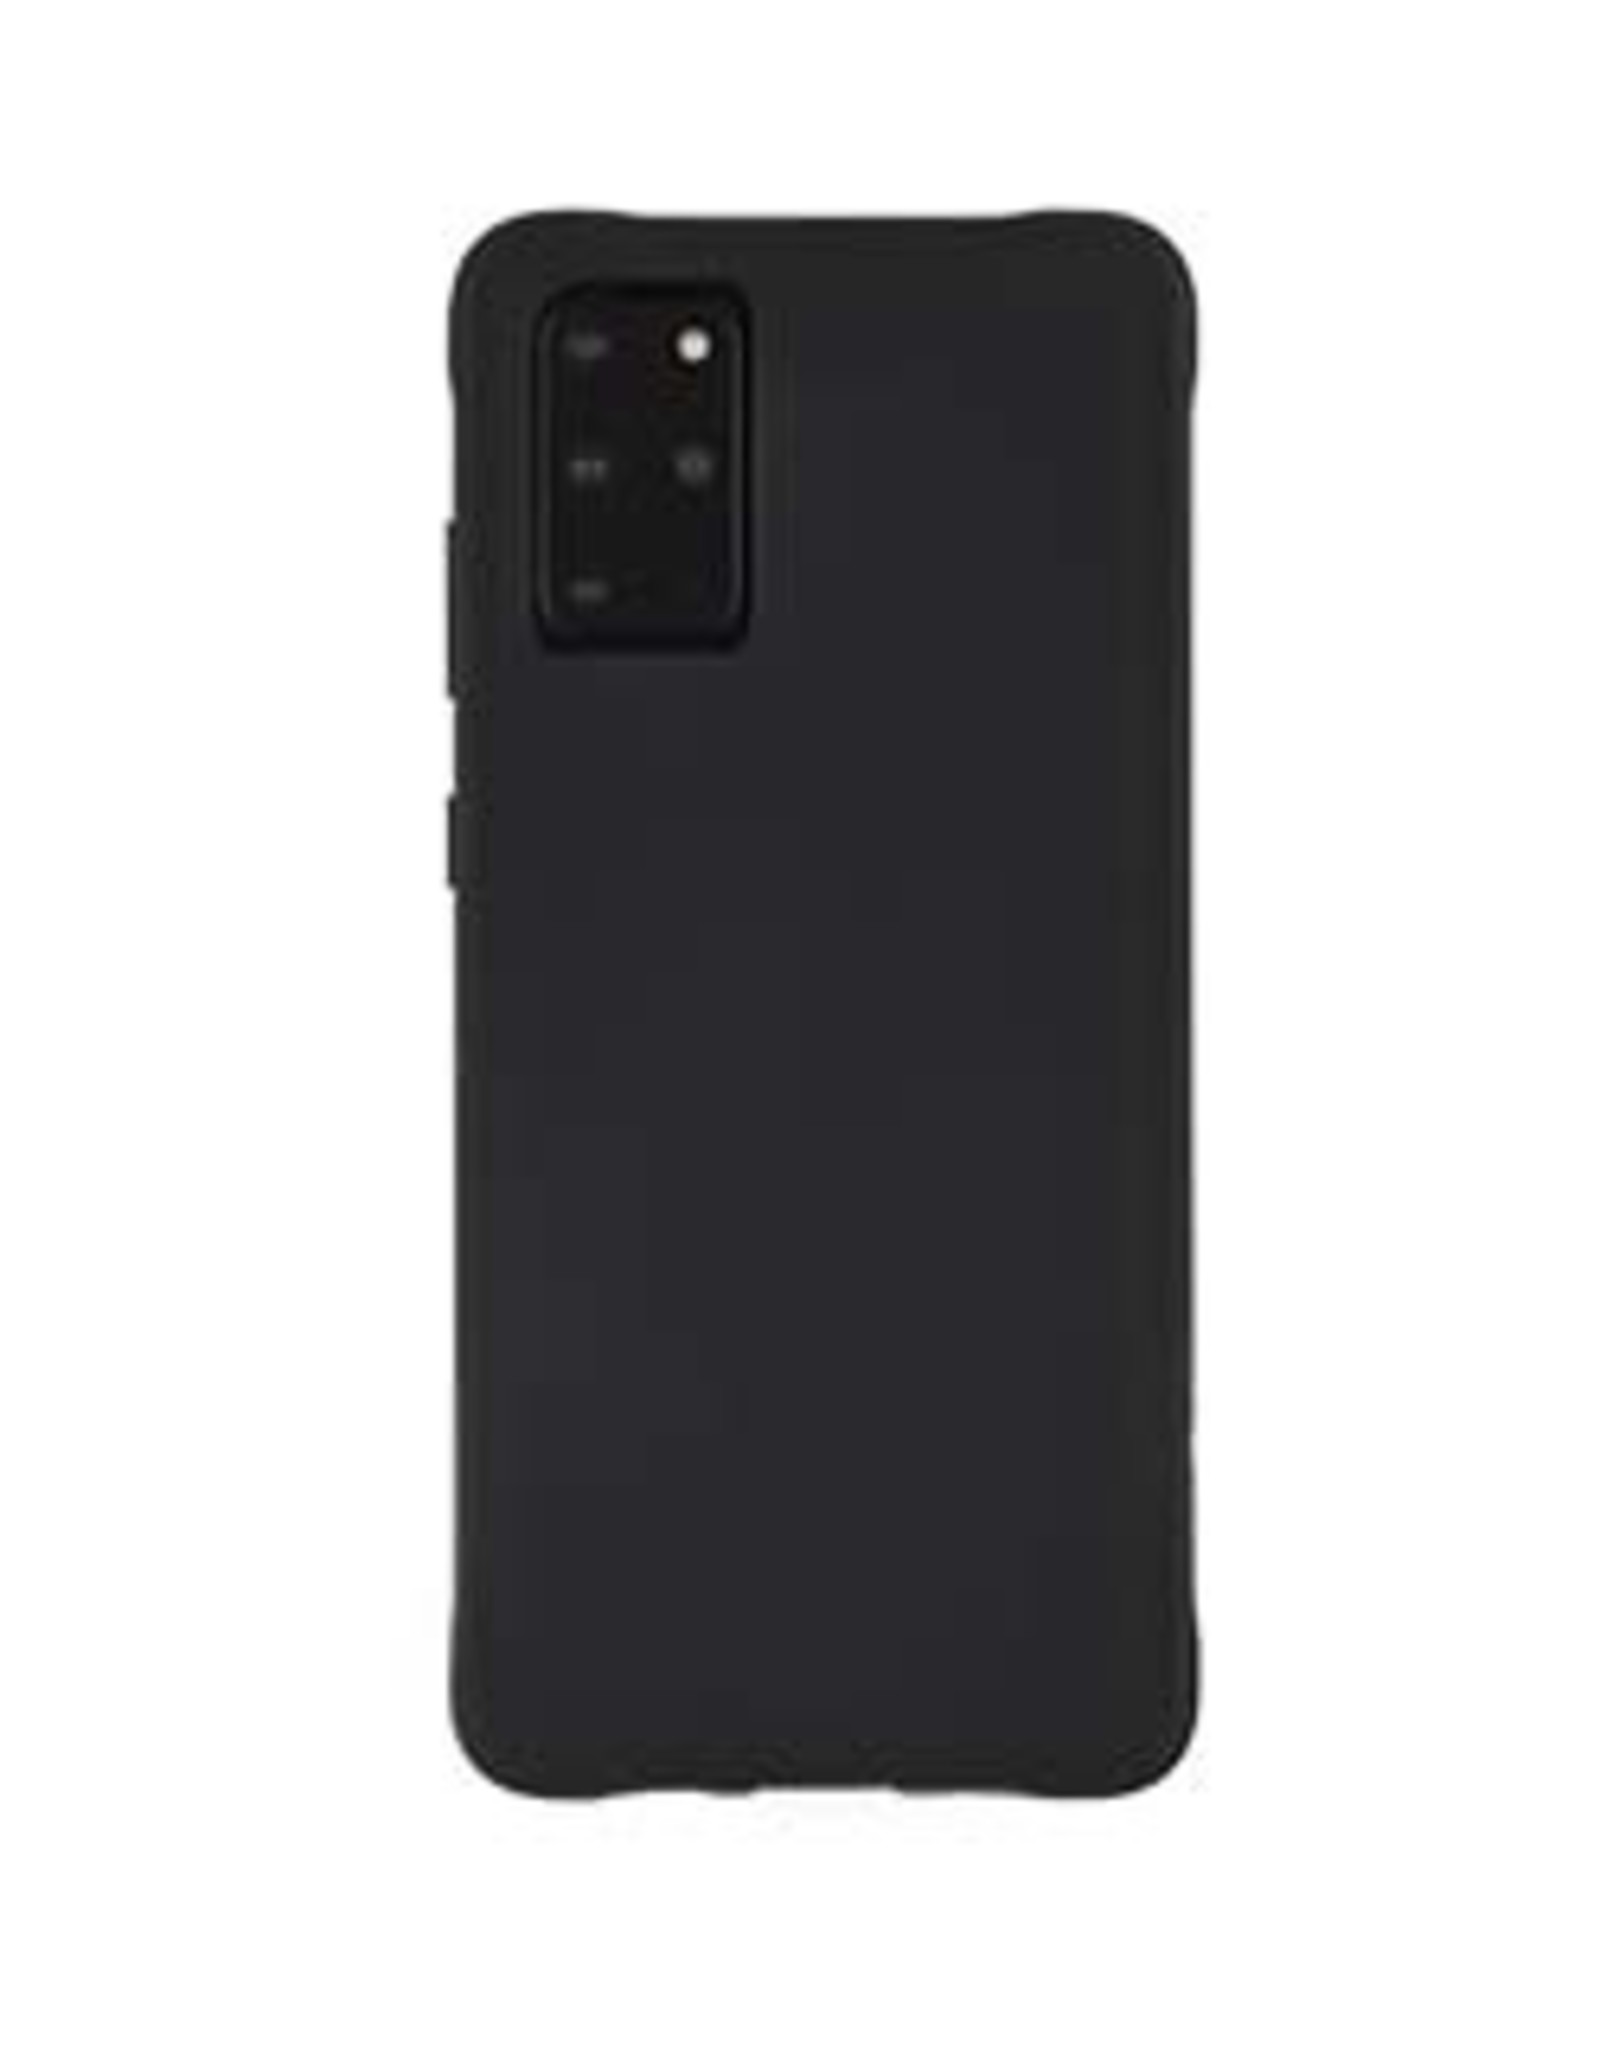 Case-Mate Case-Mate   Samsung Galaxy S20+  Black (Smoke) Tough Case15-06666